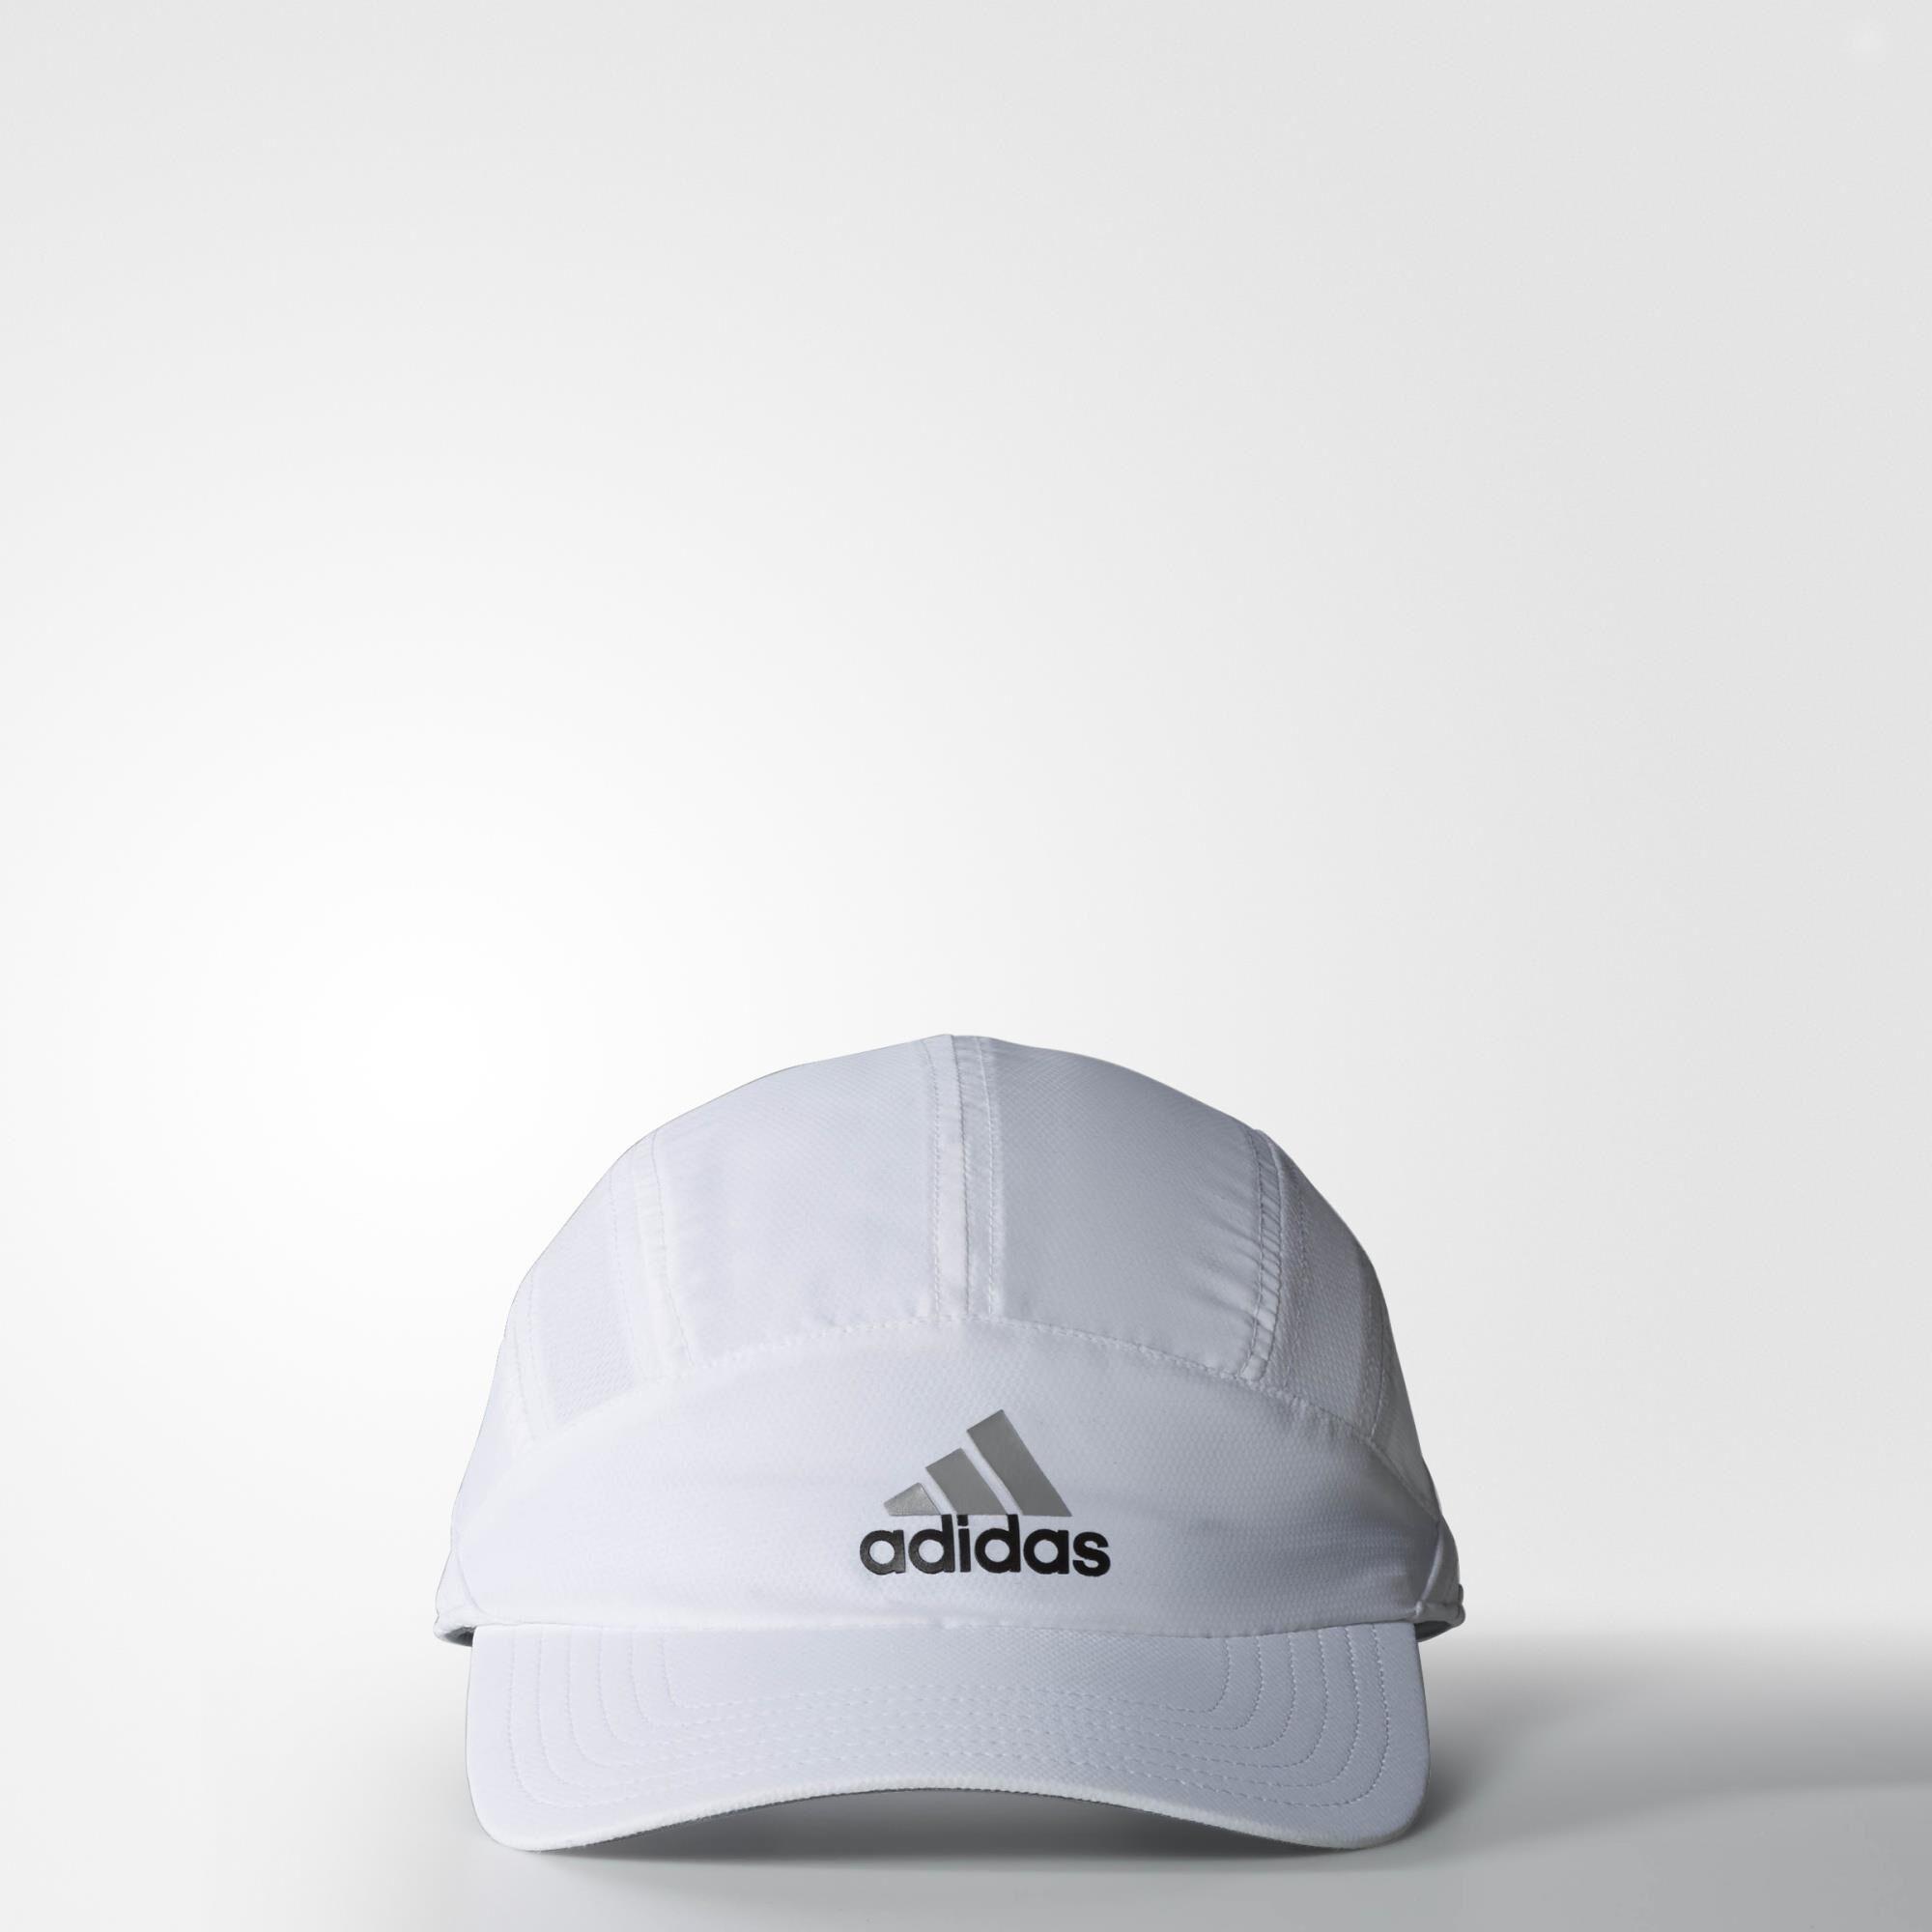 c49cb7387e7 Q18133 black adidas adidas stinger logo snapback cap lp1 mens adidas hat  S48885 01 standard